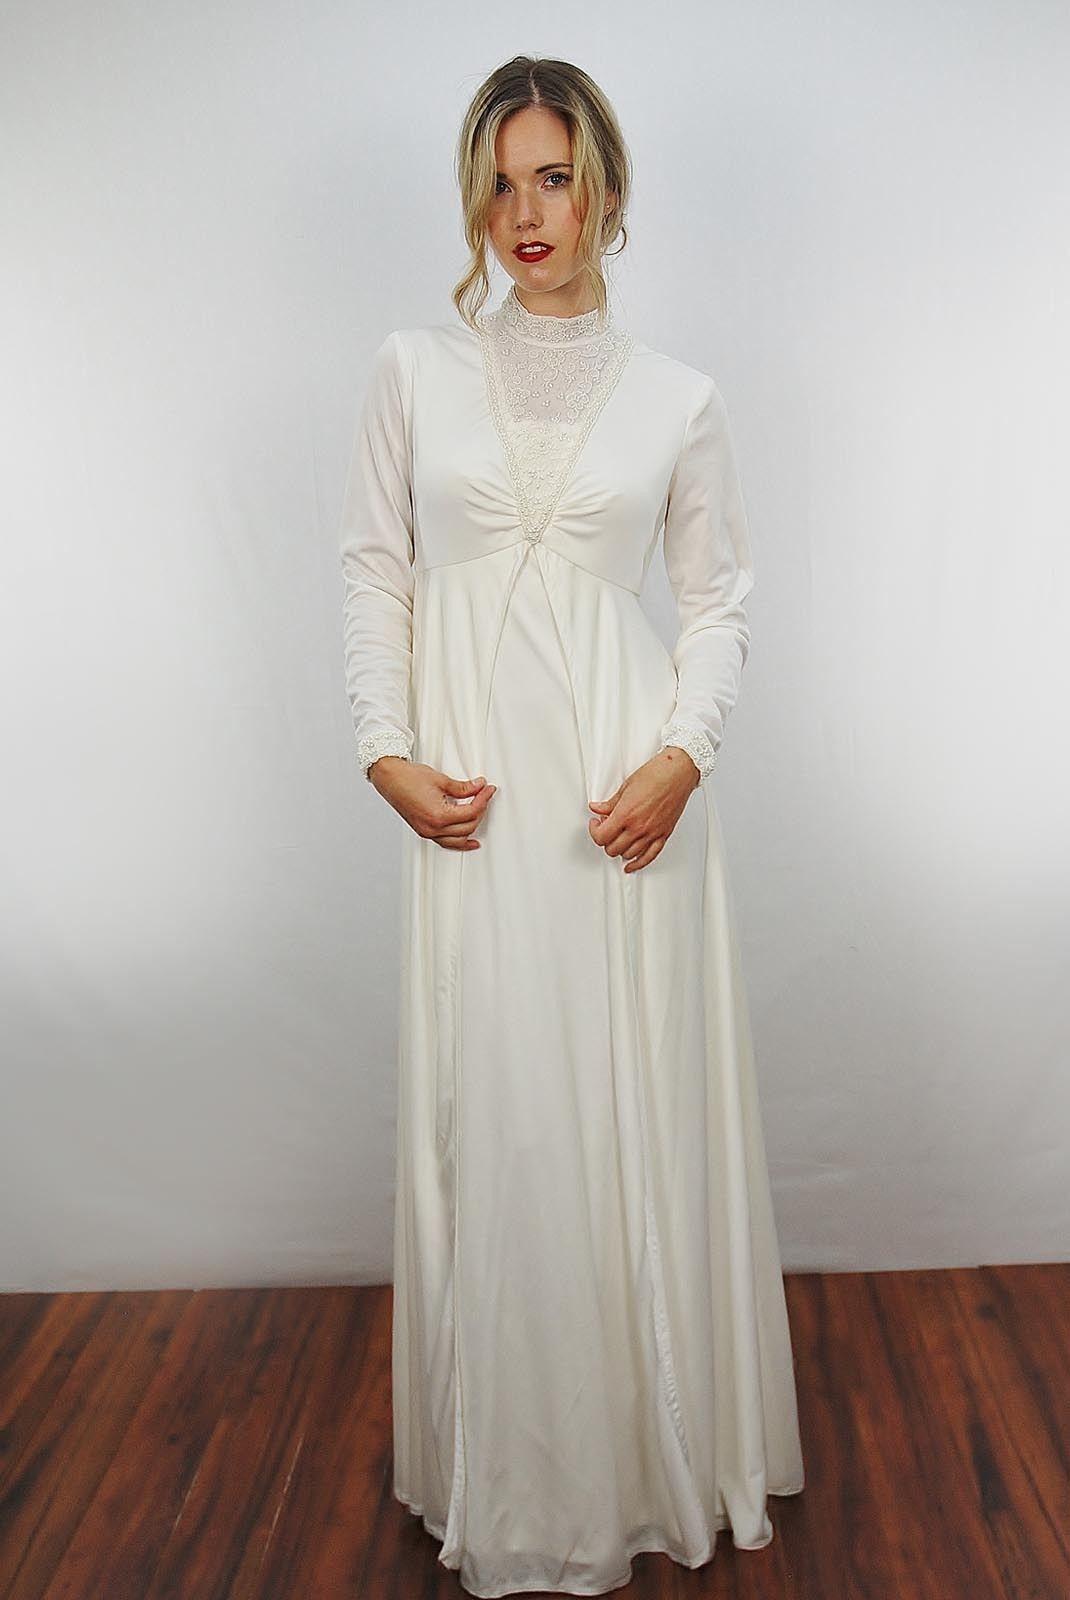 Old fashioned lace wedding dress 36